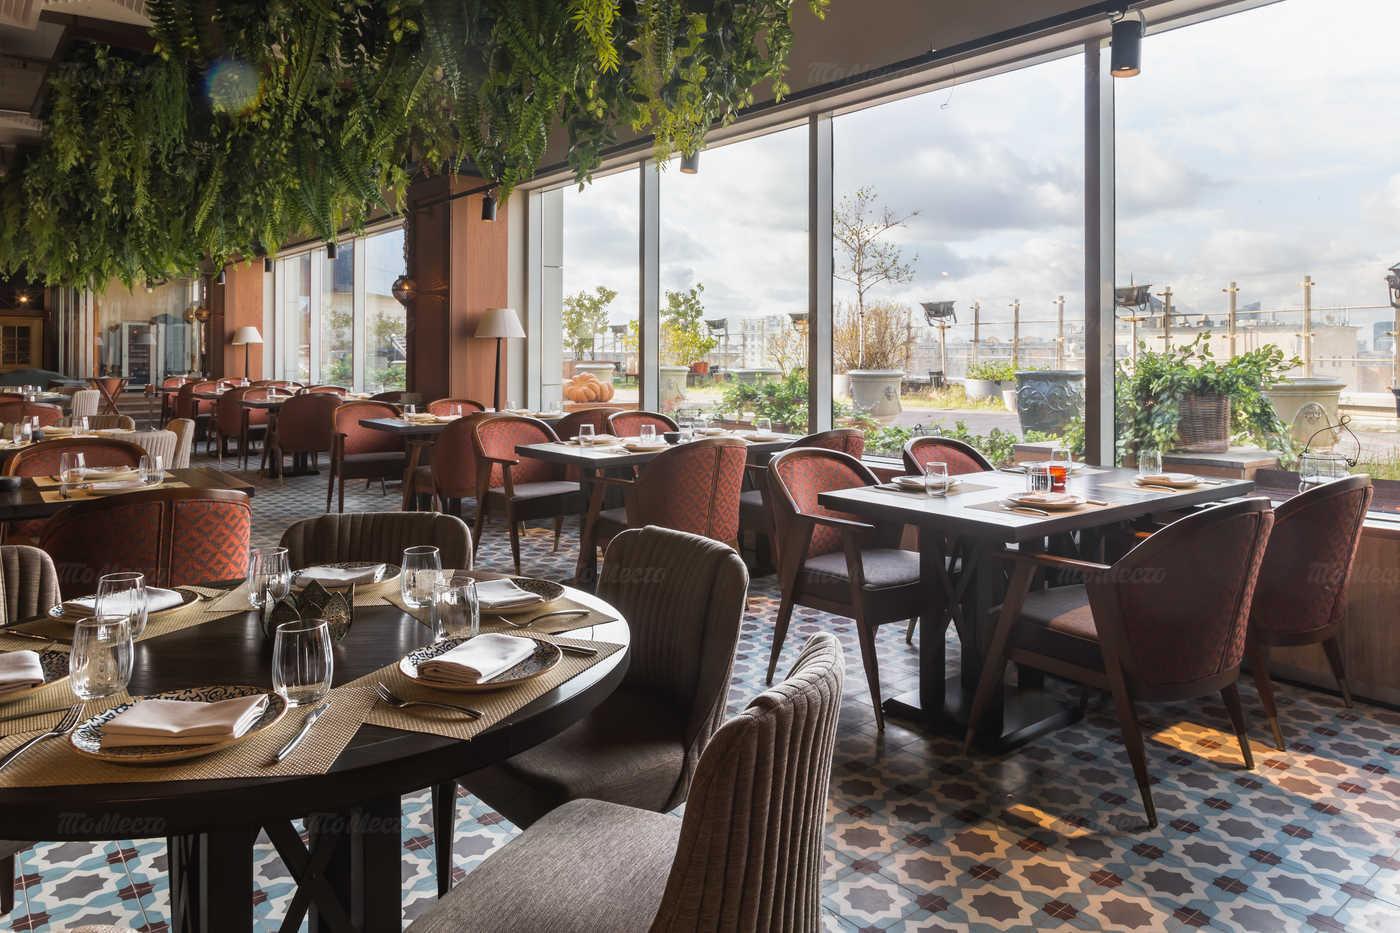 Ресторан Левантин (Levantine) на Новинском бульваре фото 15